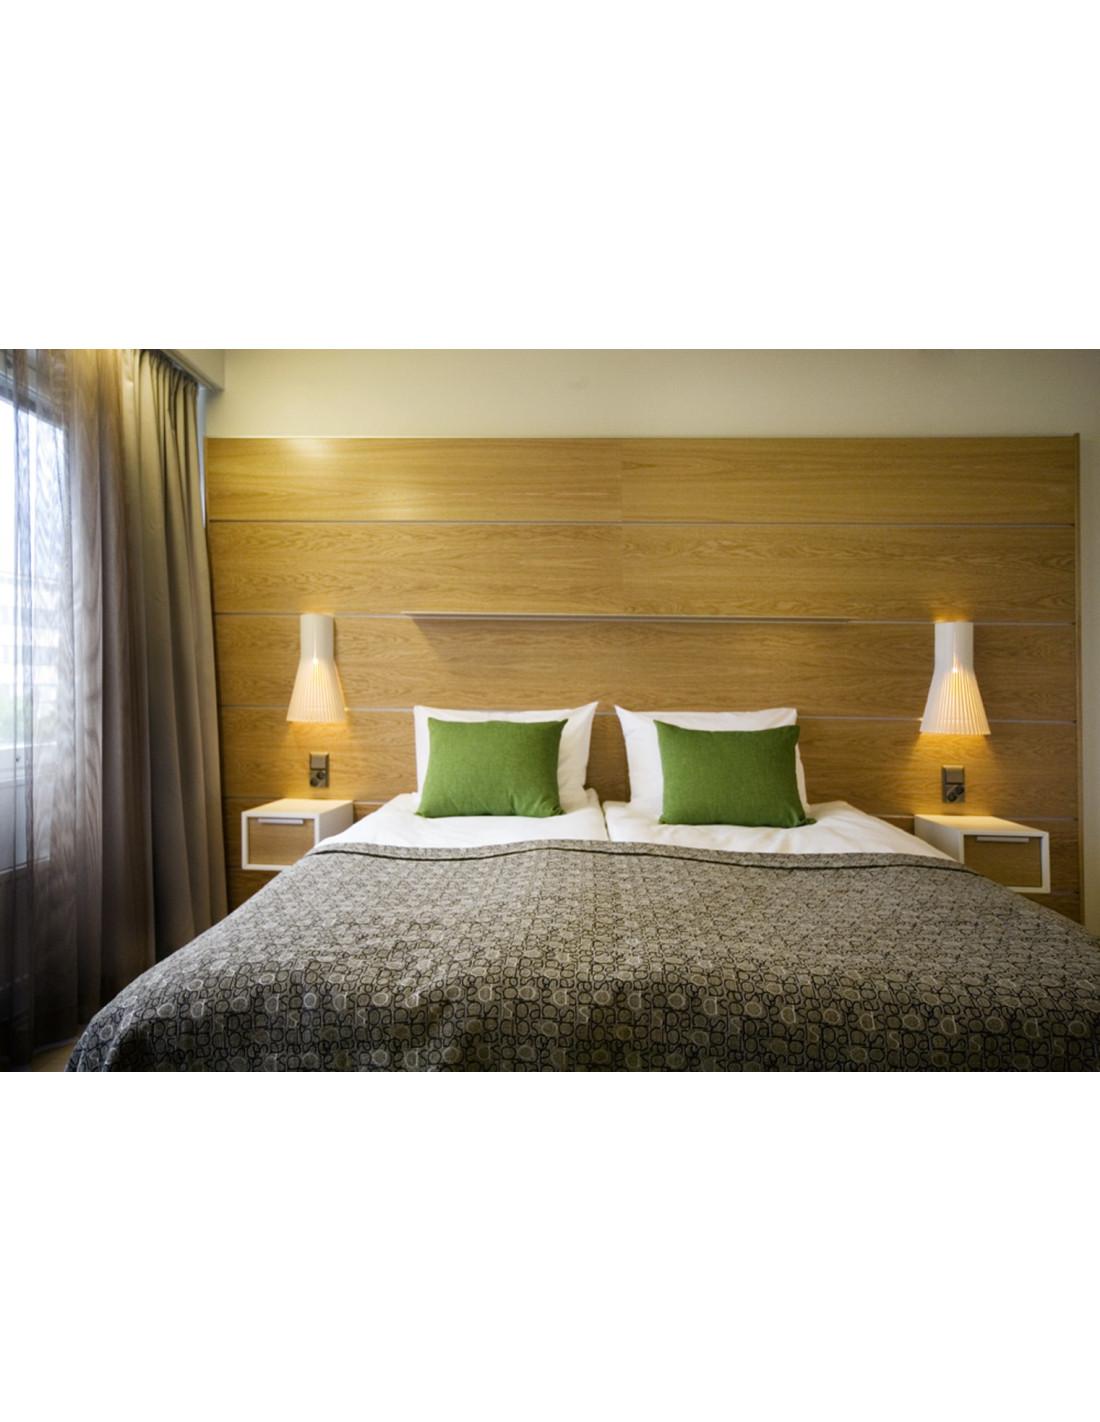 applique secto ou 4230 design seppo koho la boutique danoise. Black Bedroom Furniture Sets. Home Design Ideas